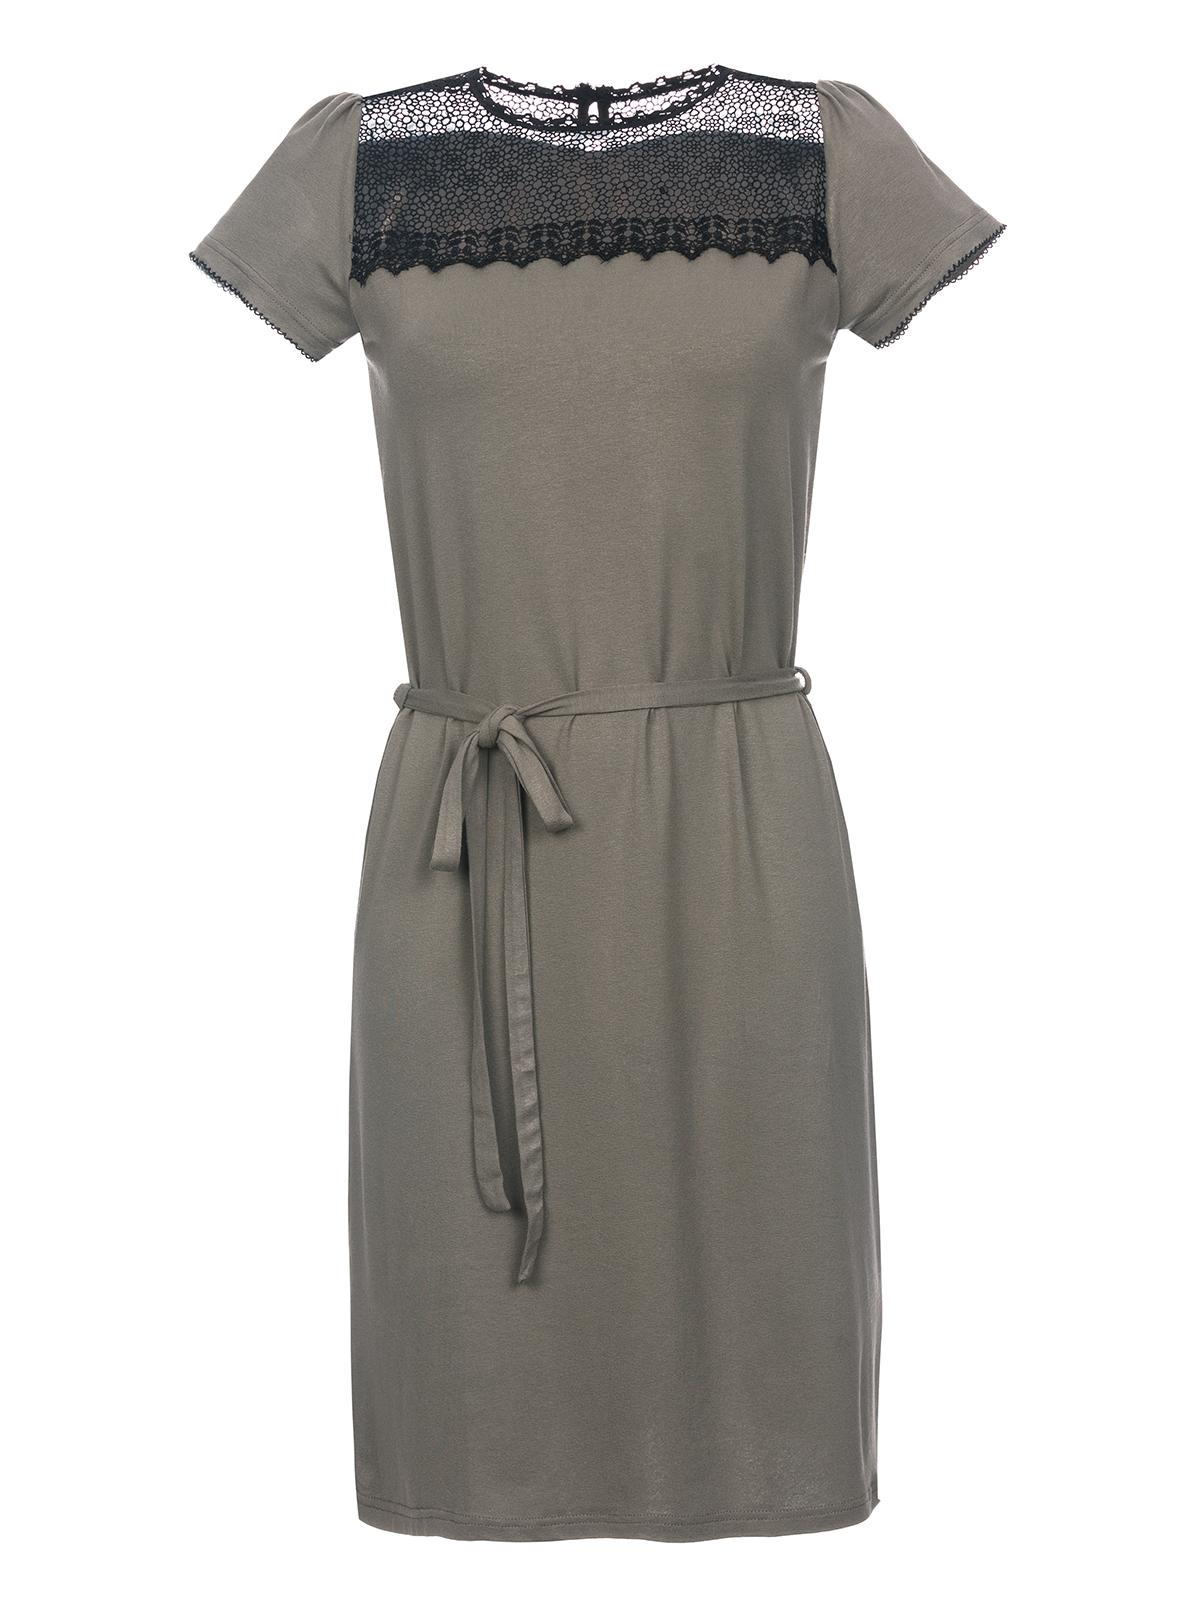 Kleider - Vive Maria Lovely Lace Dress Damen Kleid Grün – Größe M  - Onlineshop NAPO Shop